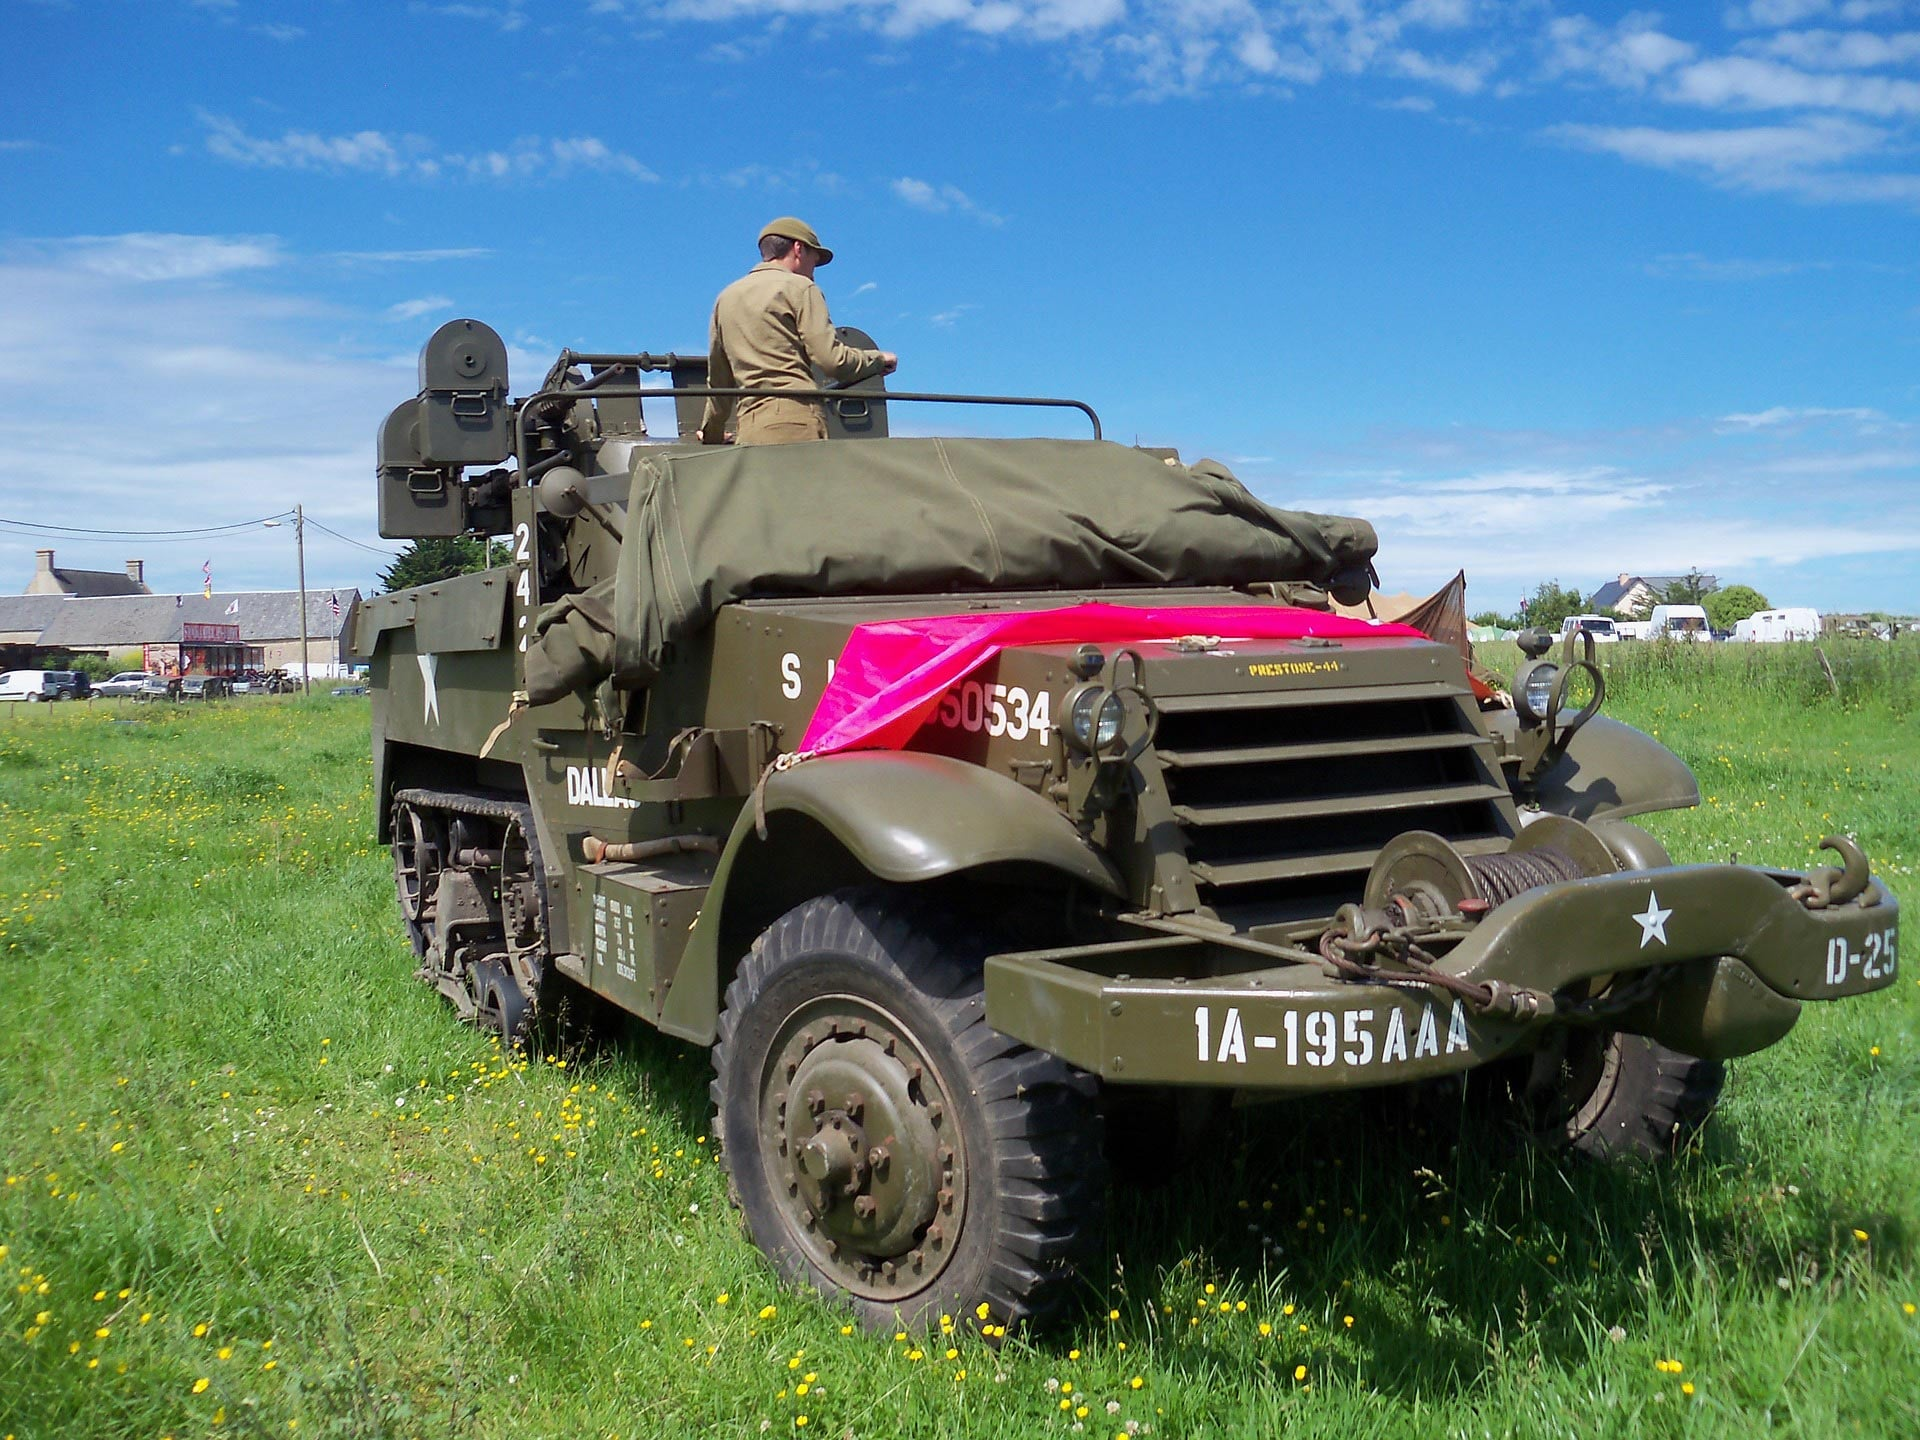 New UK Military Rapid Procurement Process for Urgent Needs